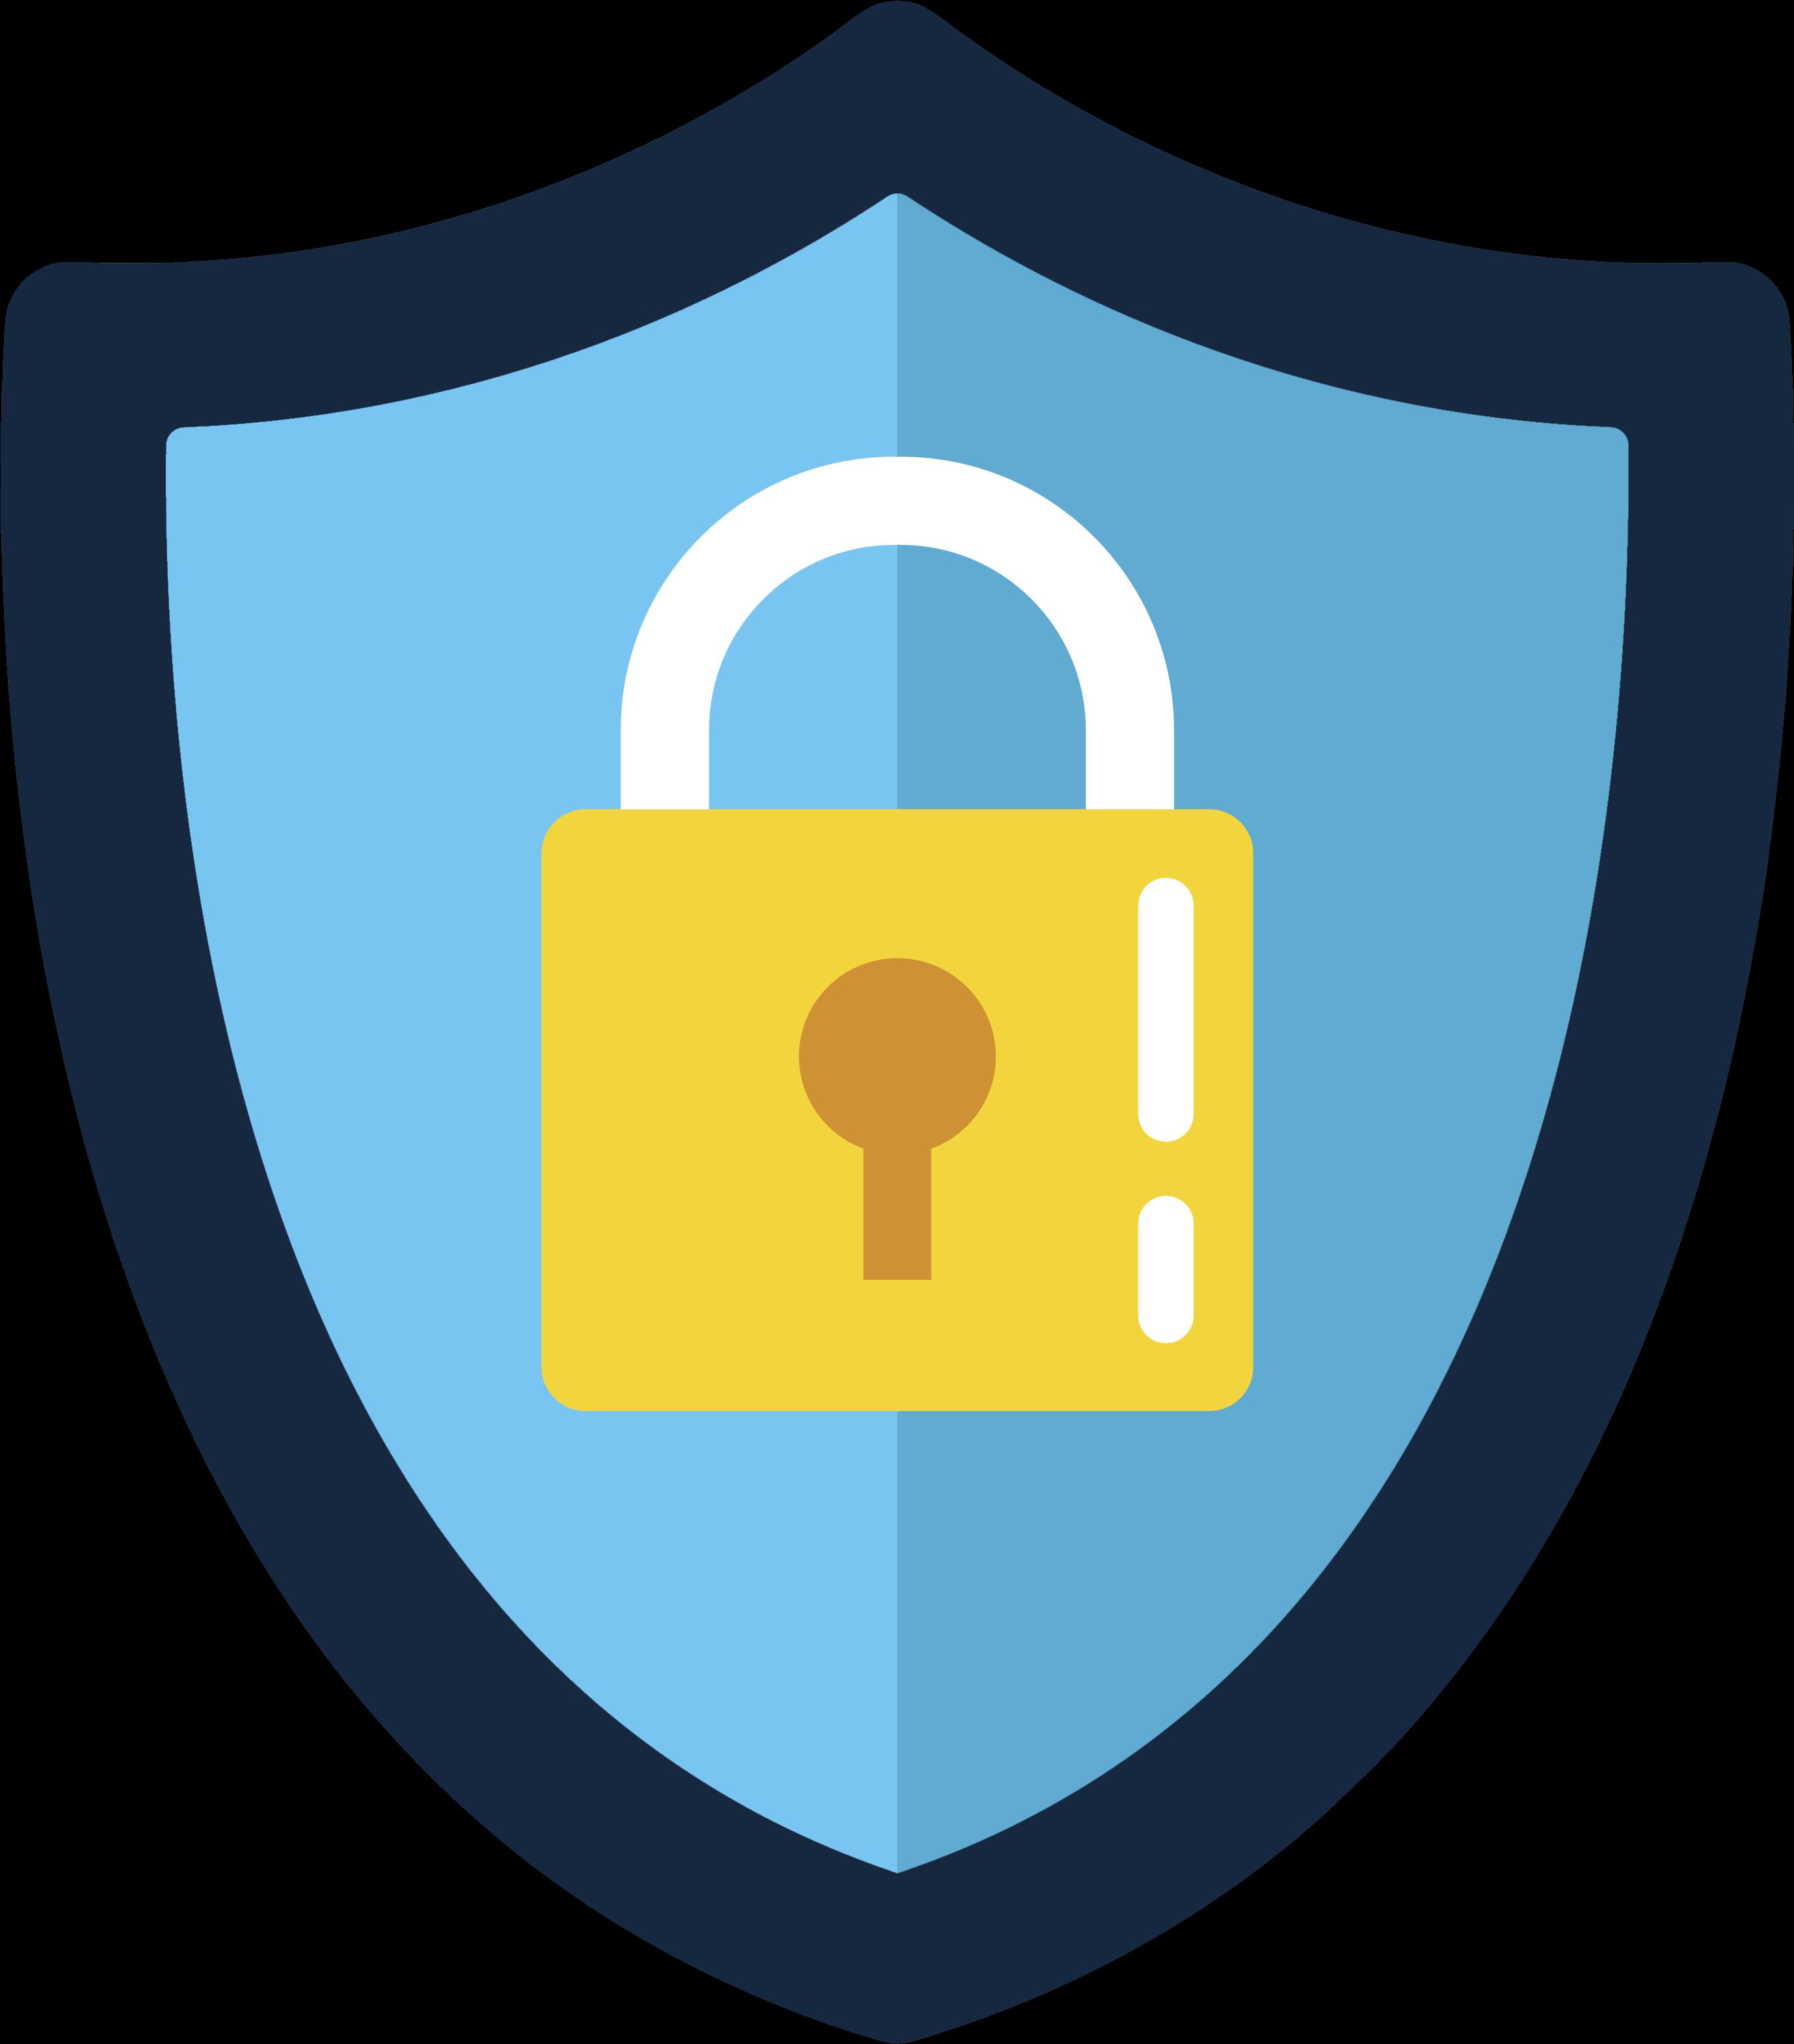 Data Security Icon - Emblem , Transparent Cartoon - Jing.fm